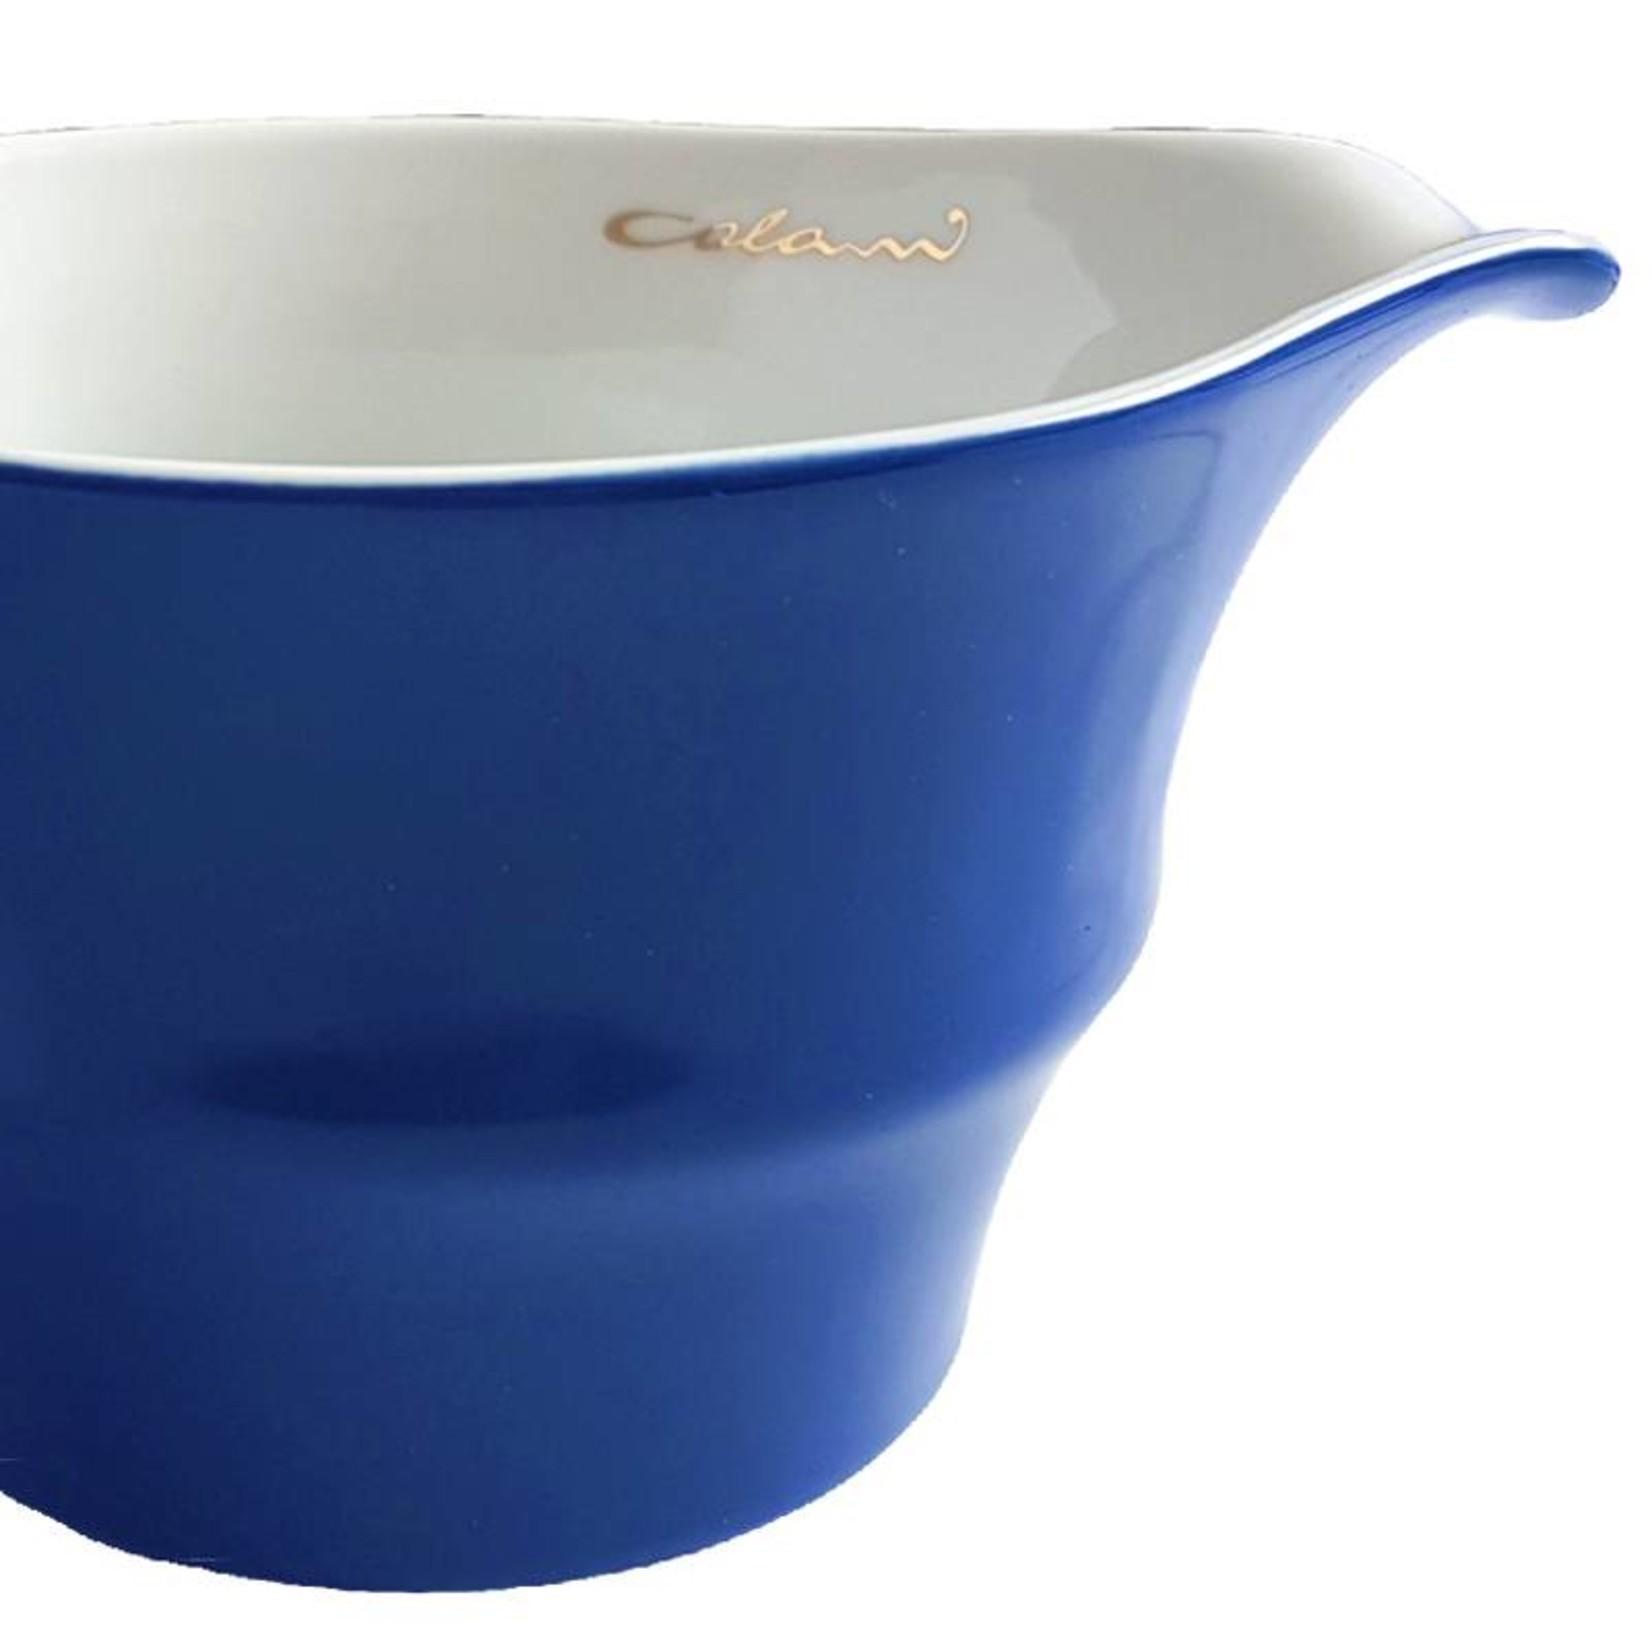 Colani Porzellanserie Colani Müslischale I blau I Schüssel I Porzellan